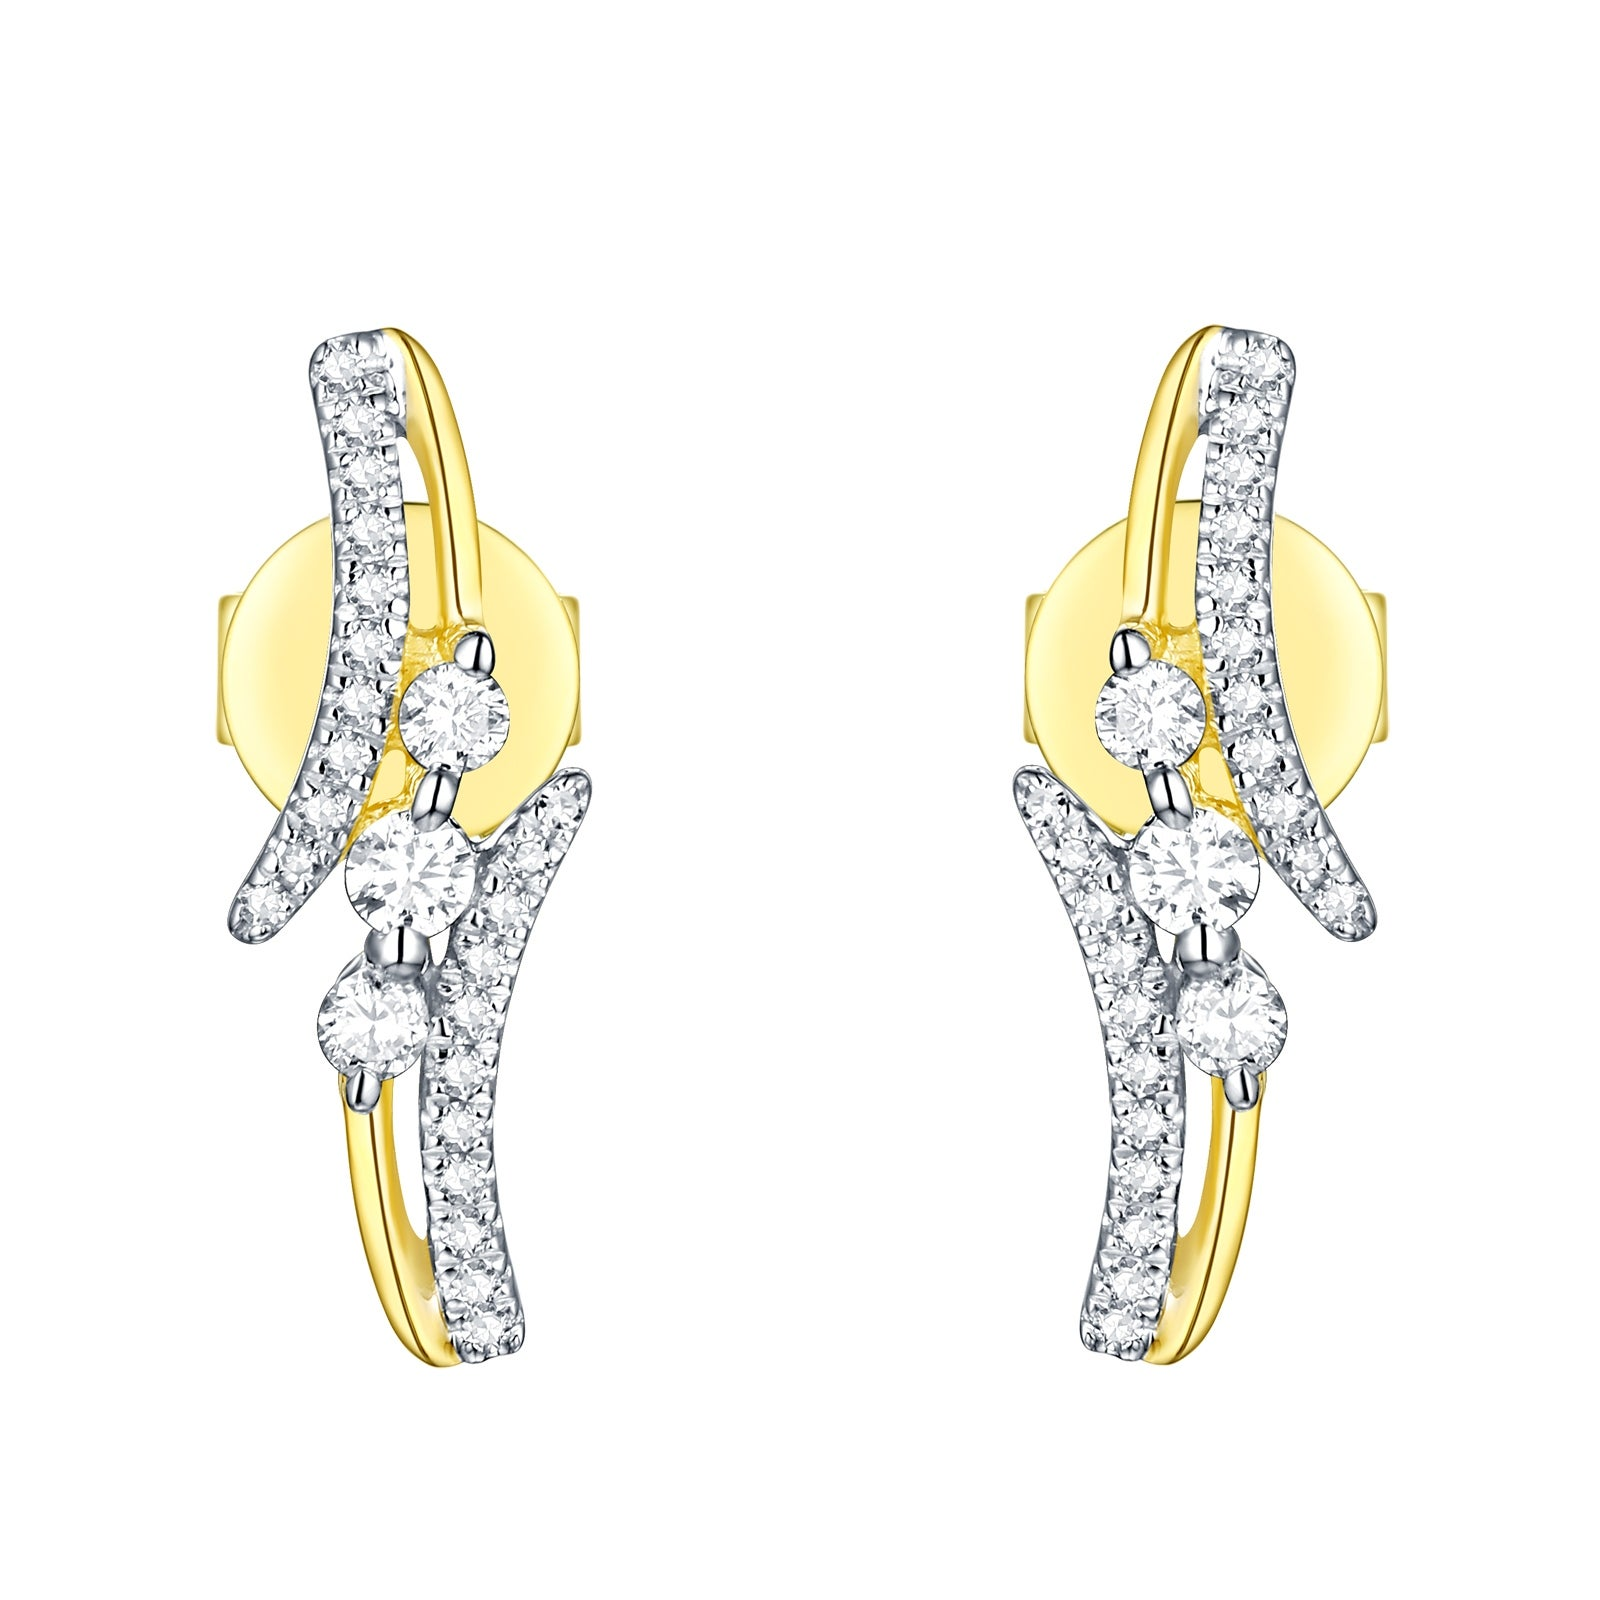 Prism Jewel 0.21 Carat Round G-H//I1 Natural Diamond Stylist Ring 10k Gold